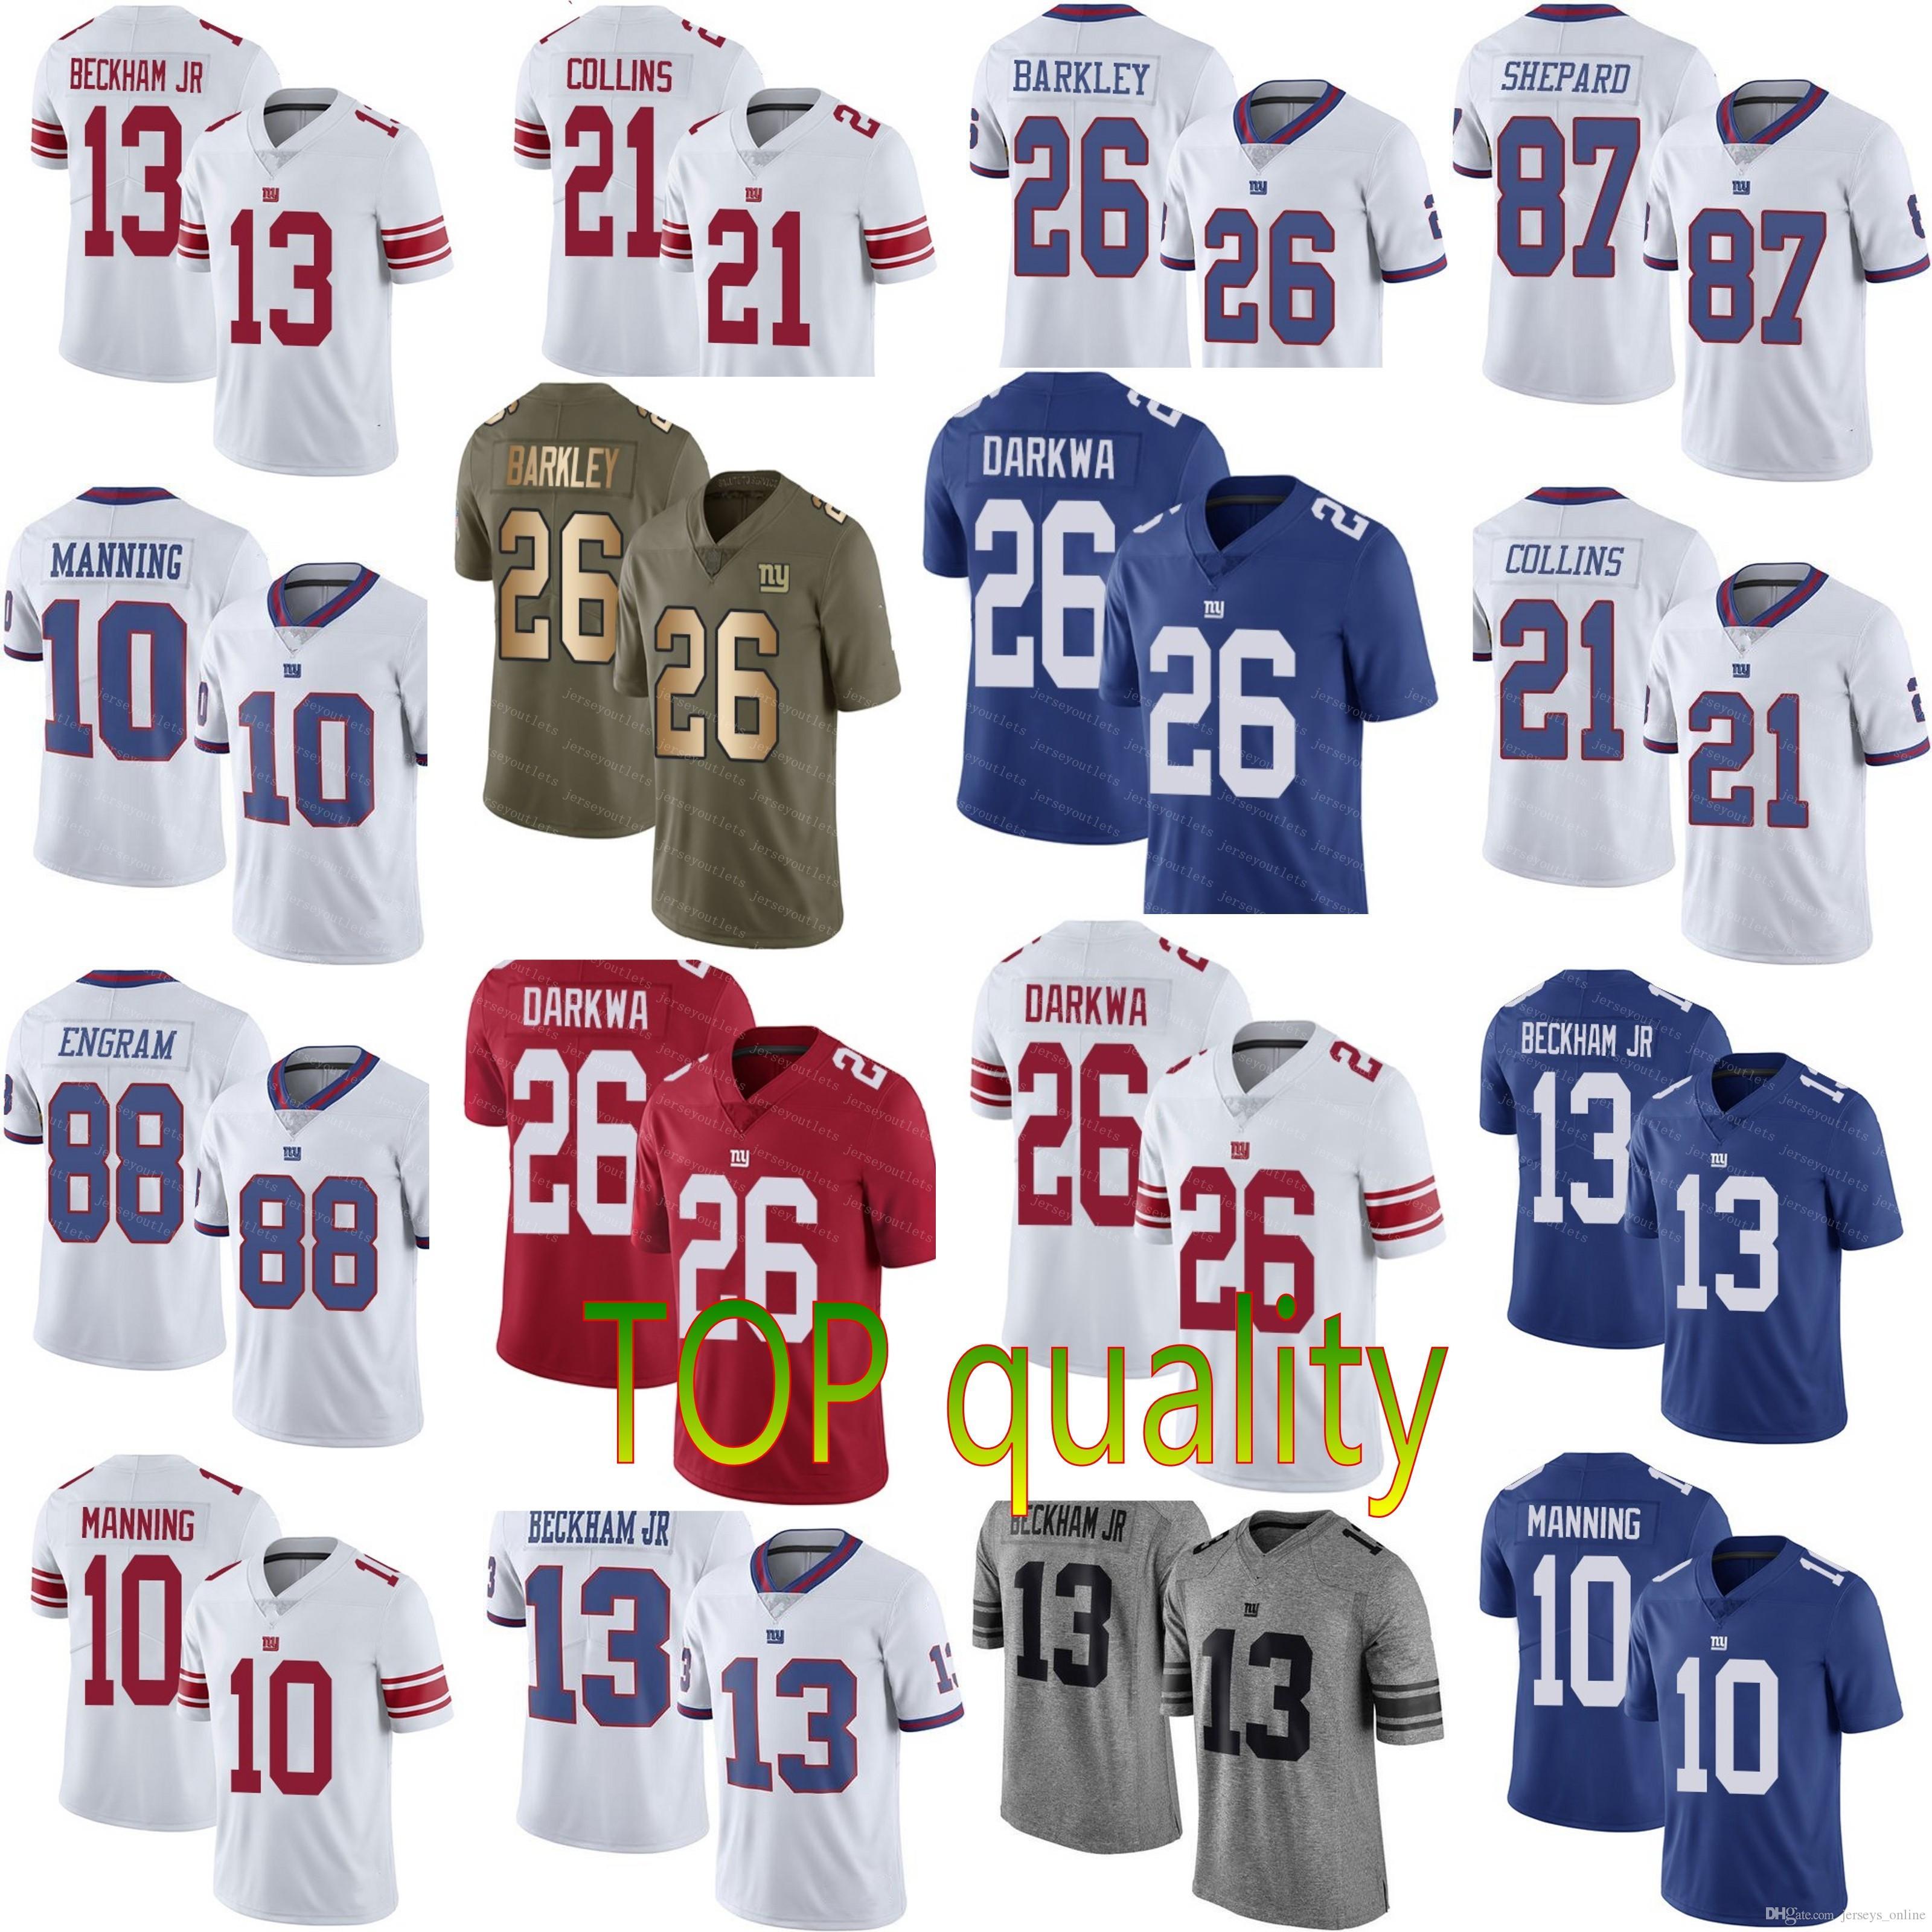 2019 2019 Mens New York 26 Saquon Barkley 13 Odell Beckham Jr Giants 10 Eli  Manning 21 Landon Collins Jerseys Cheap Size S 3XL From Jerseys online 2755fa90e